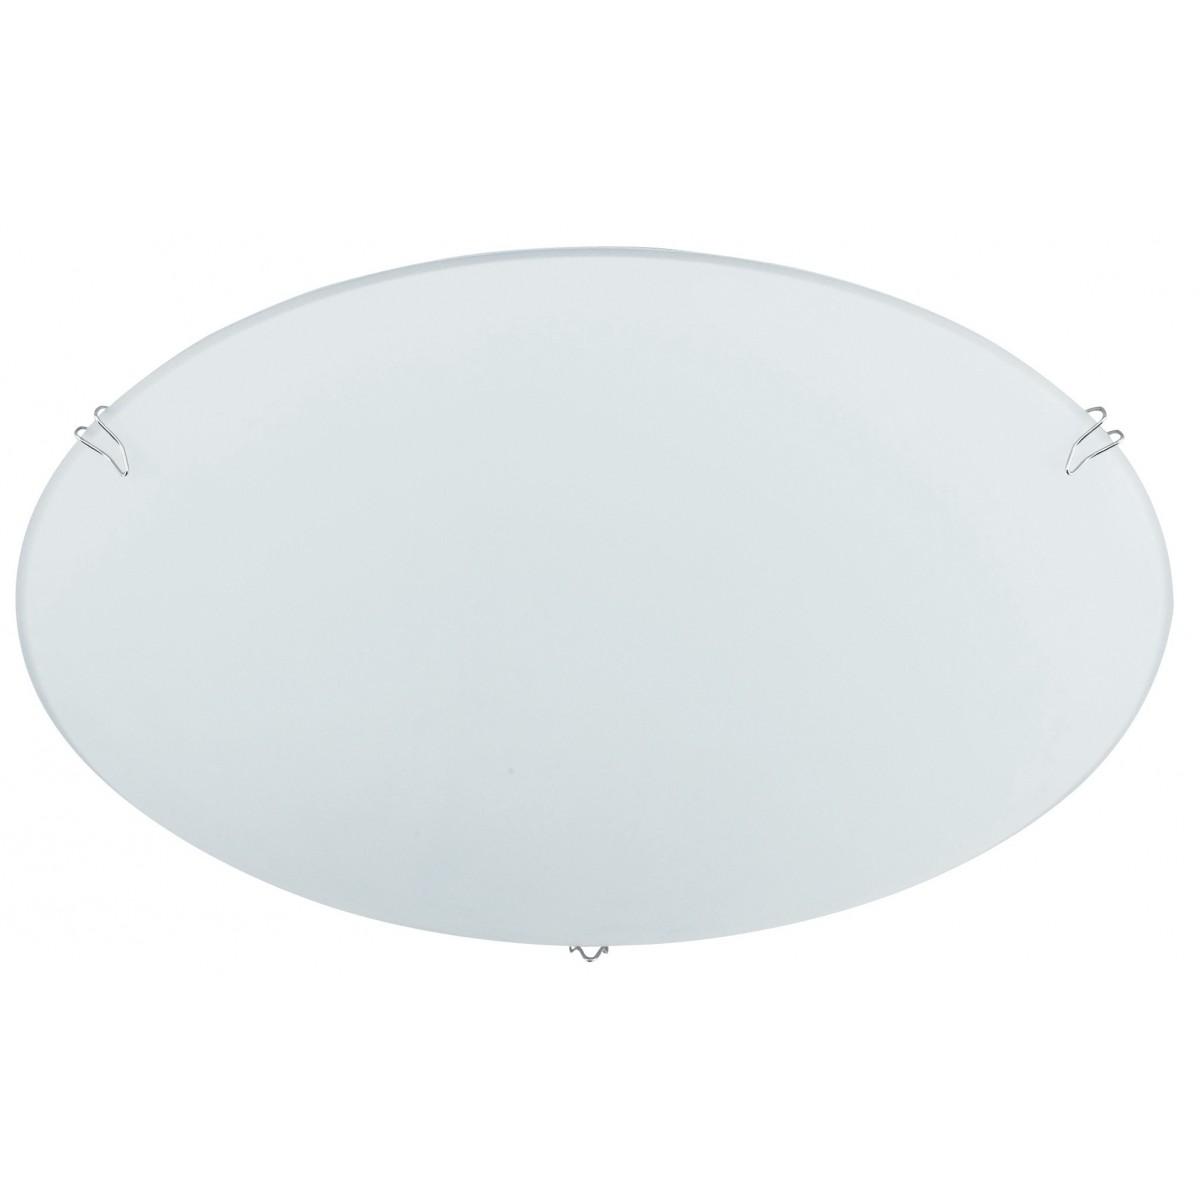 74/01212 - Plafoniera Lampada Moderna Tonda Vetro Bianco Interno E27